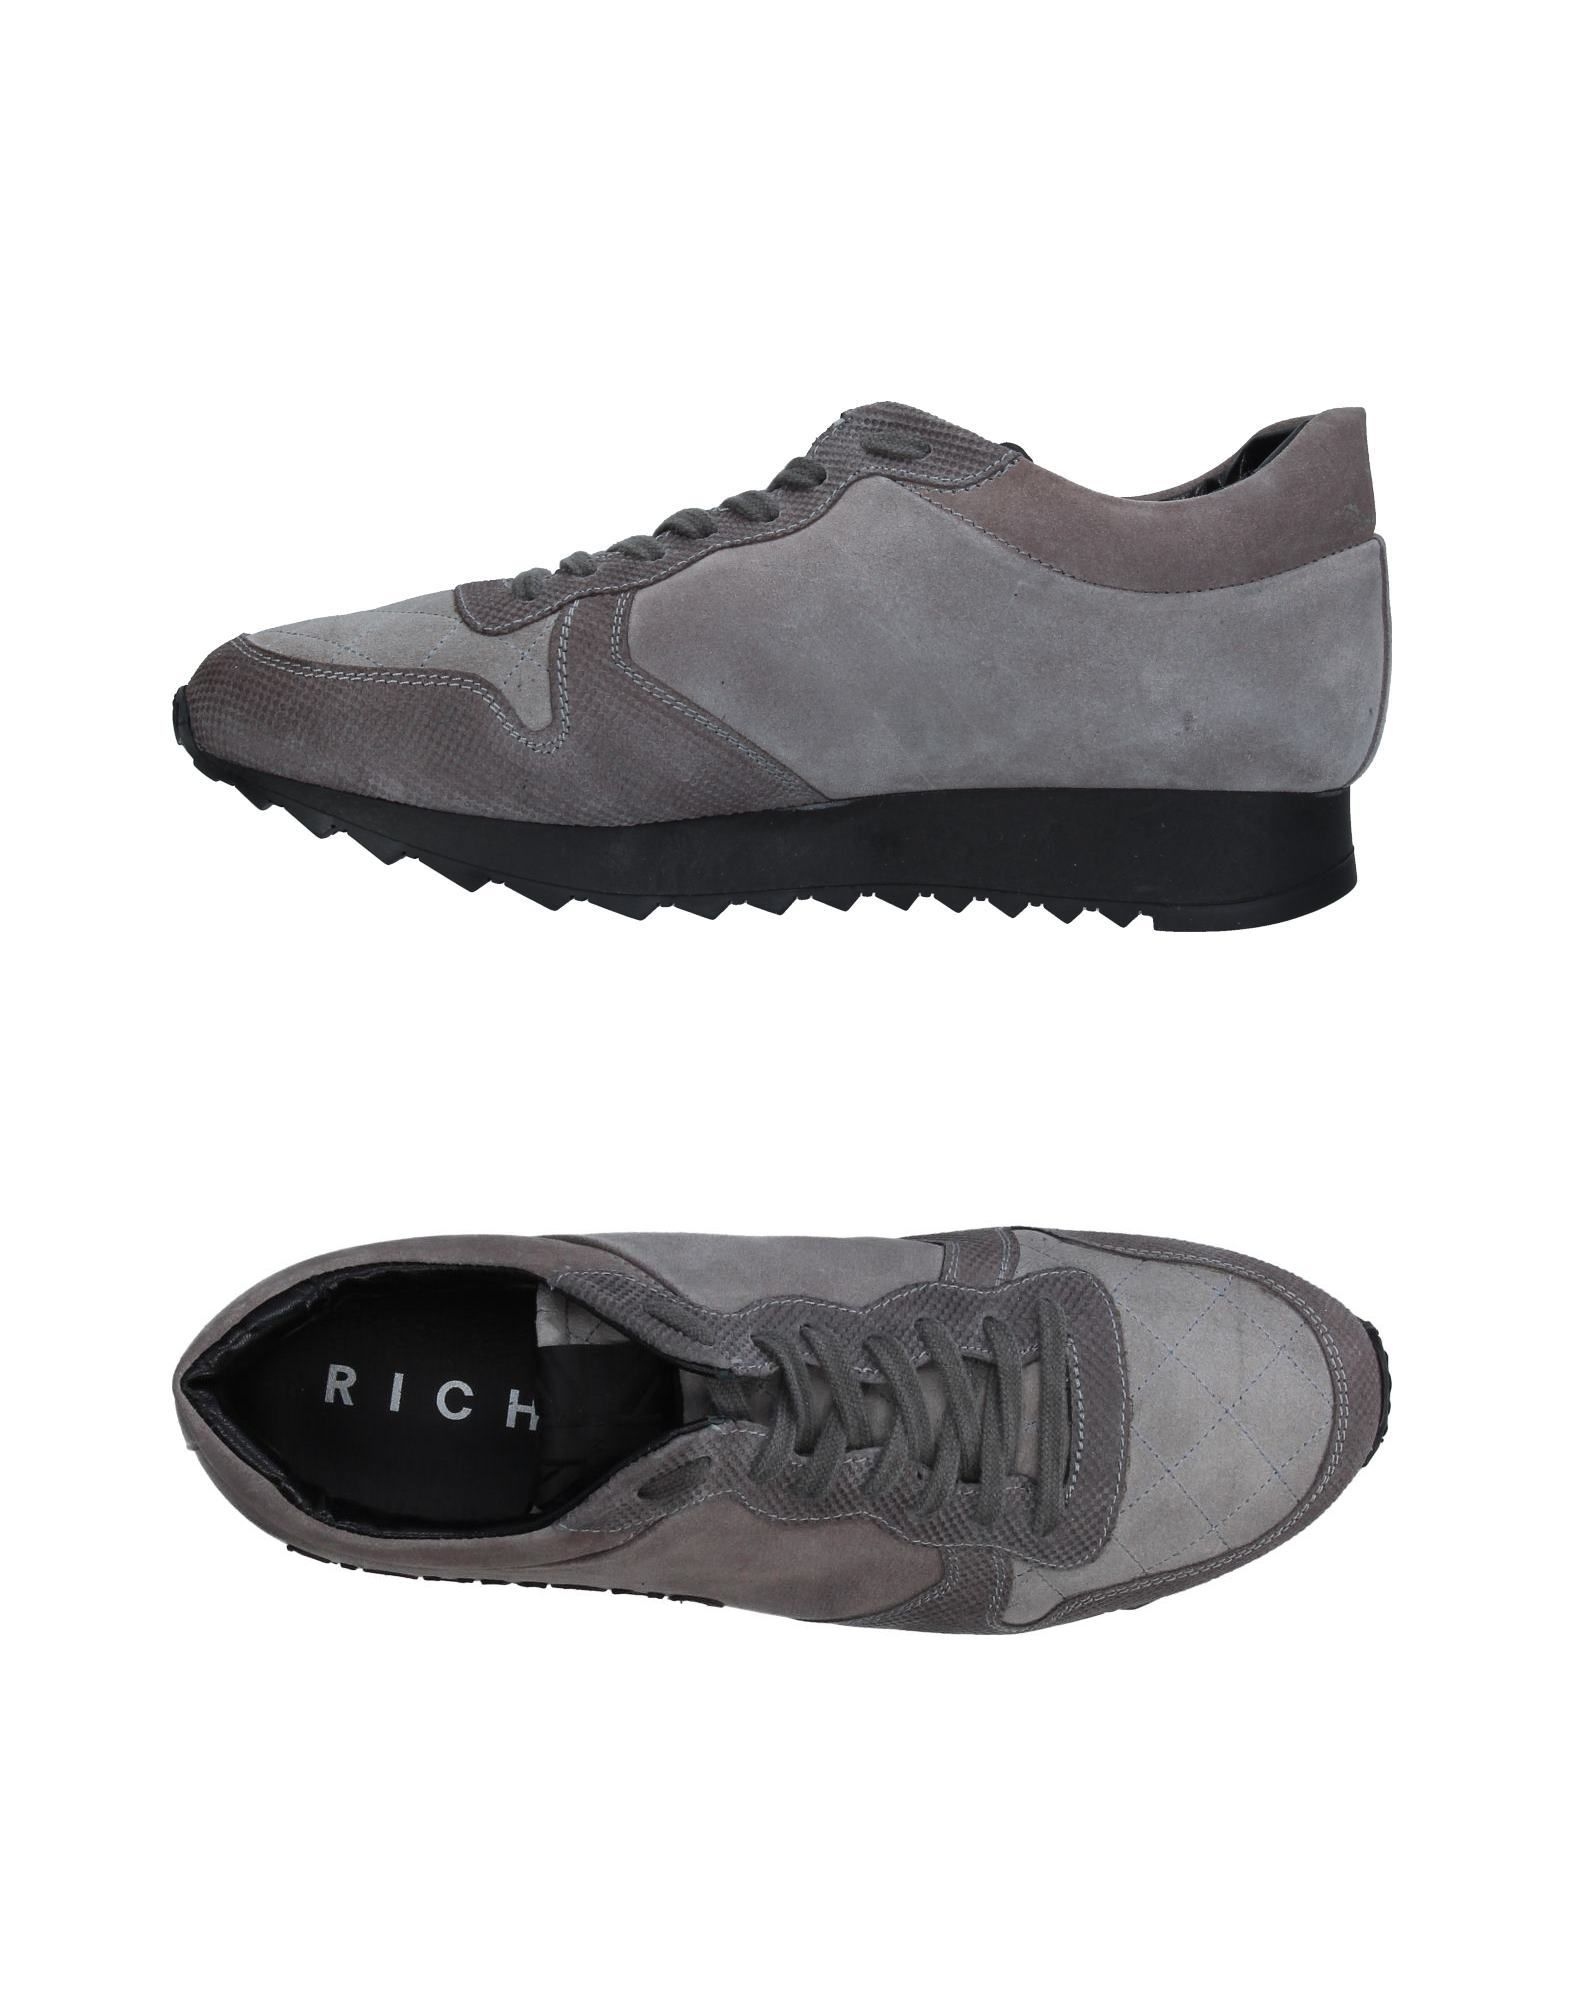 RICHMOND Низкие кеды и кроссовки pierre hardy низкие кеды и кроссовки